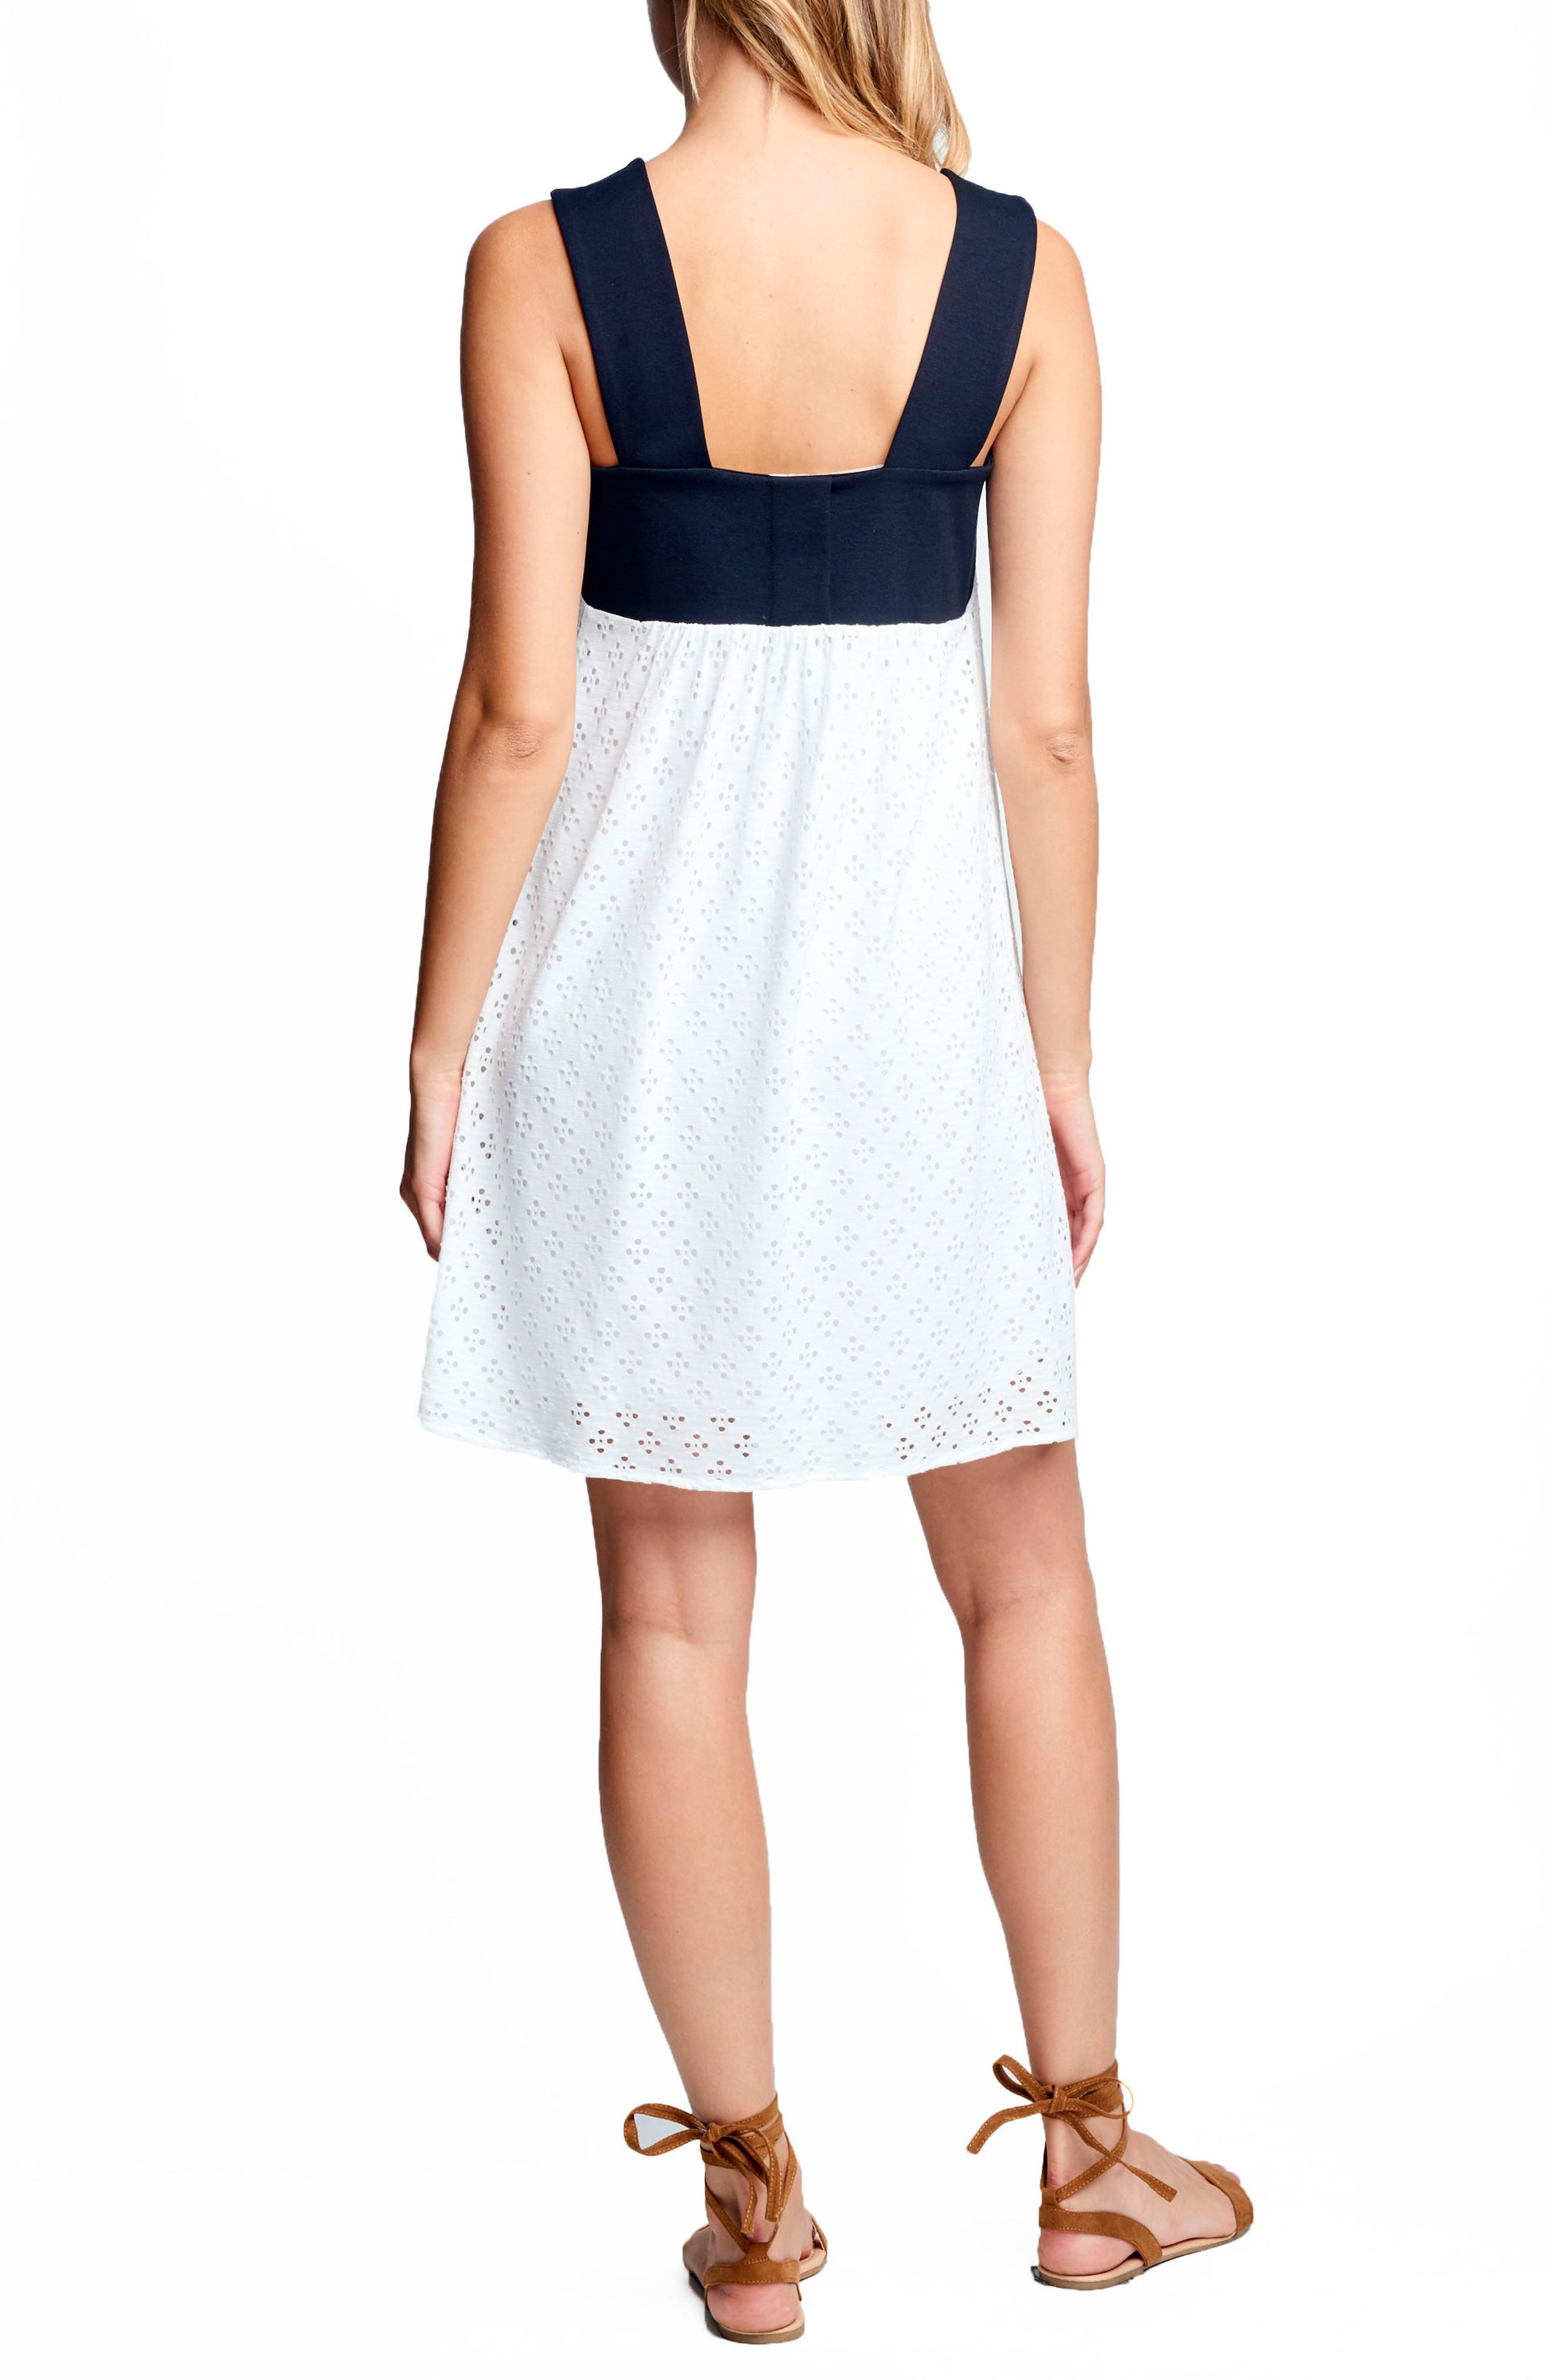 Babydoll Maternity Dress,                             Alternate thumbnail 2, color,                             White Eyelet/ Black